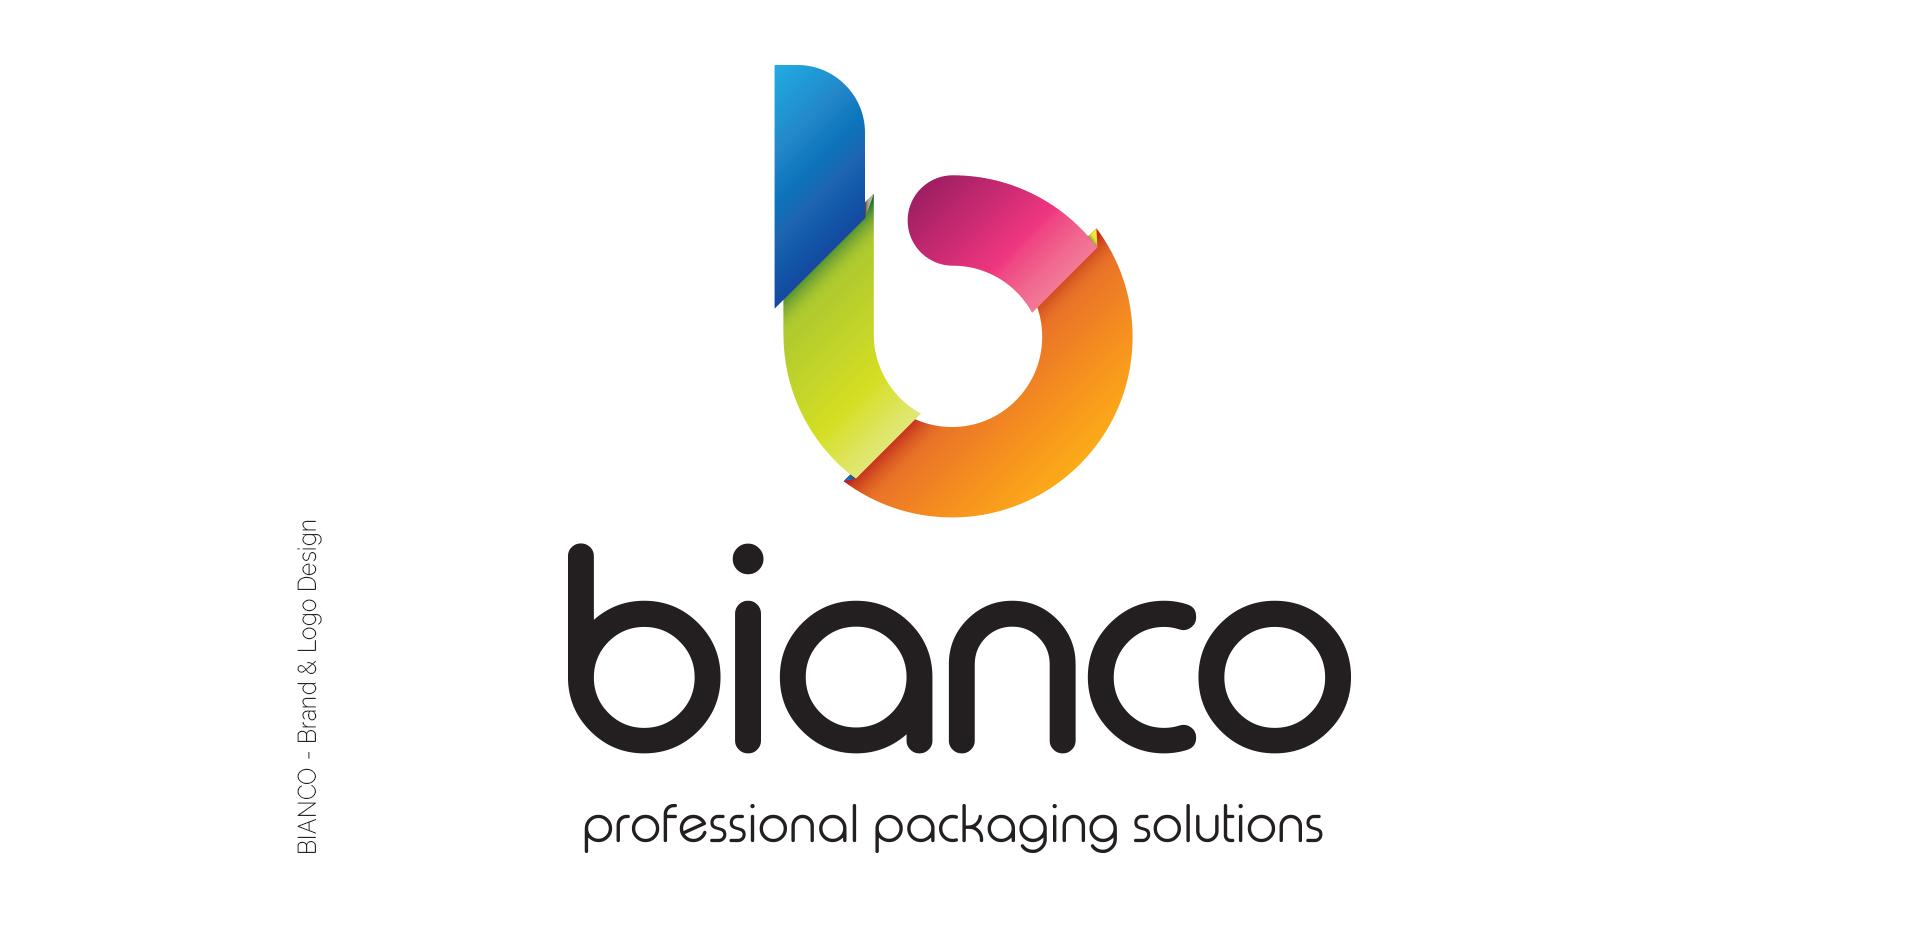 marketing agency graphic designer